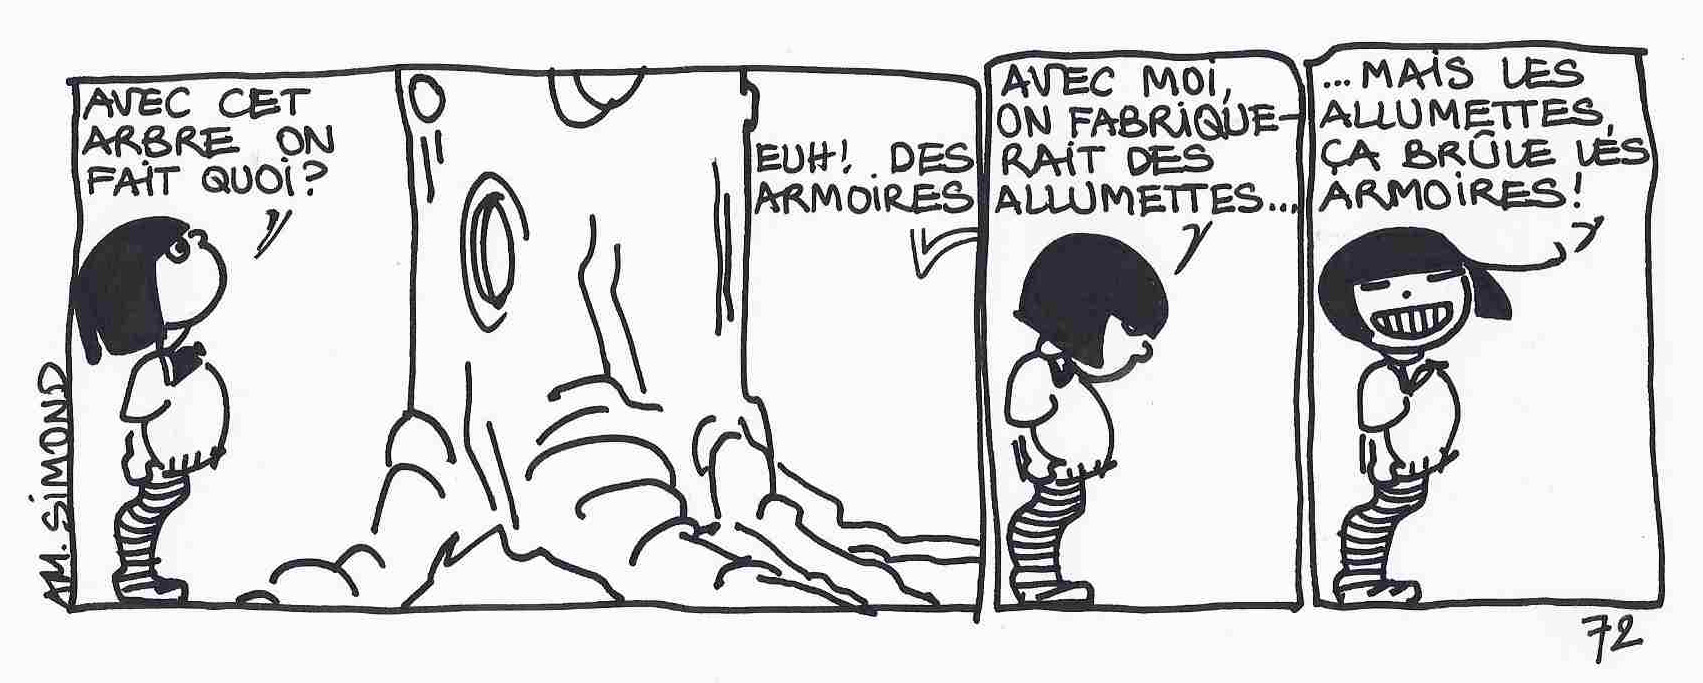 dp-%c2%a9-anne-marie-simond_comics_annees-80_la-petite-alice-44_rotring_118-ko